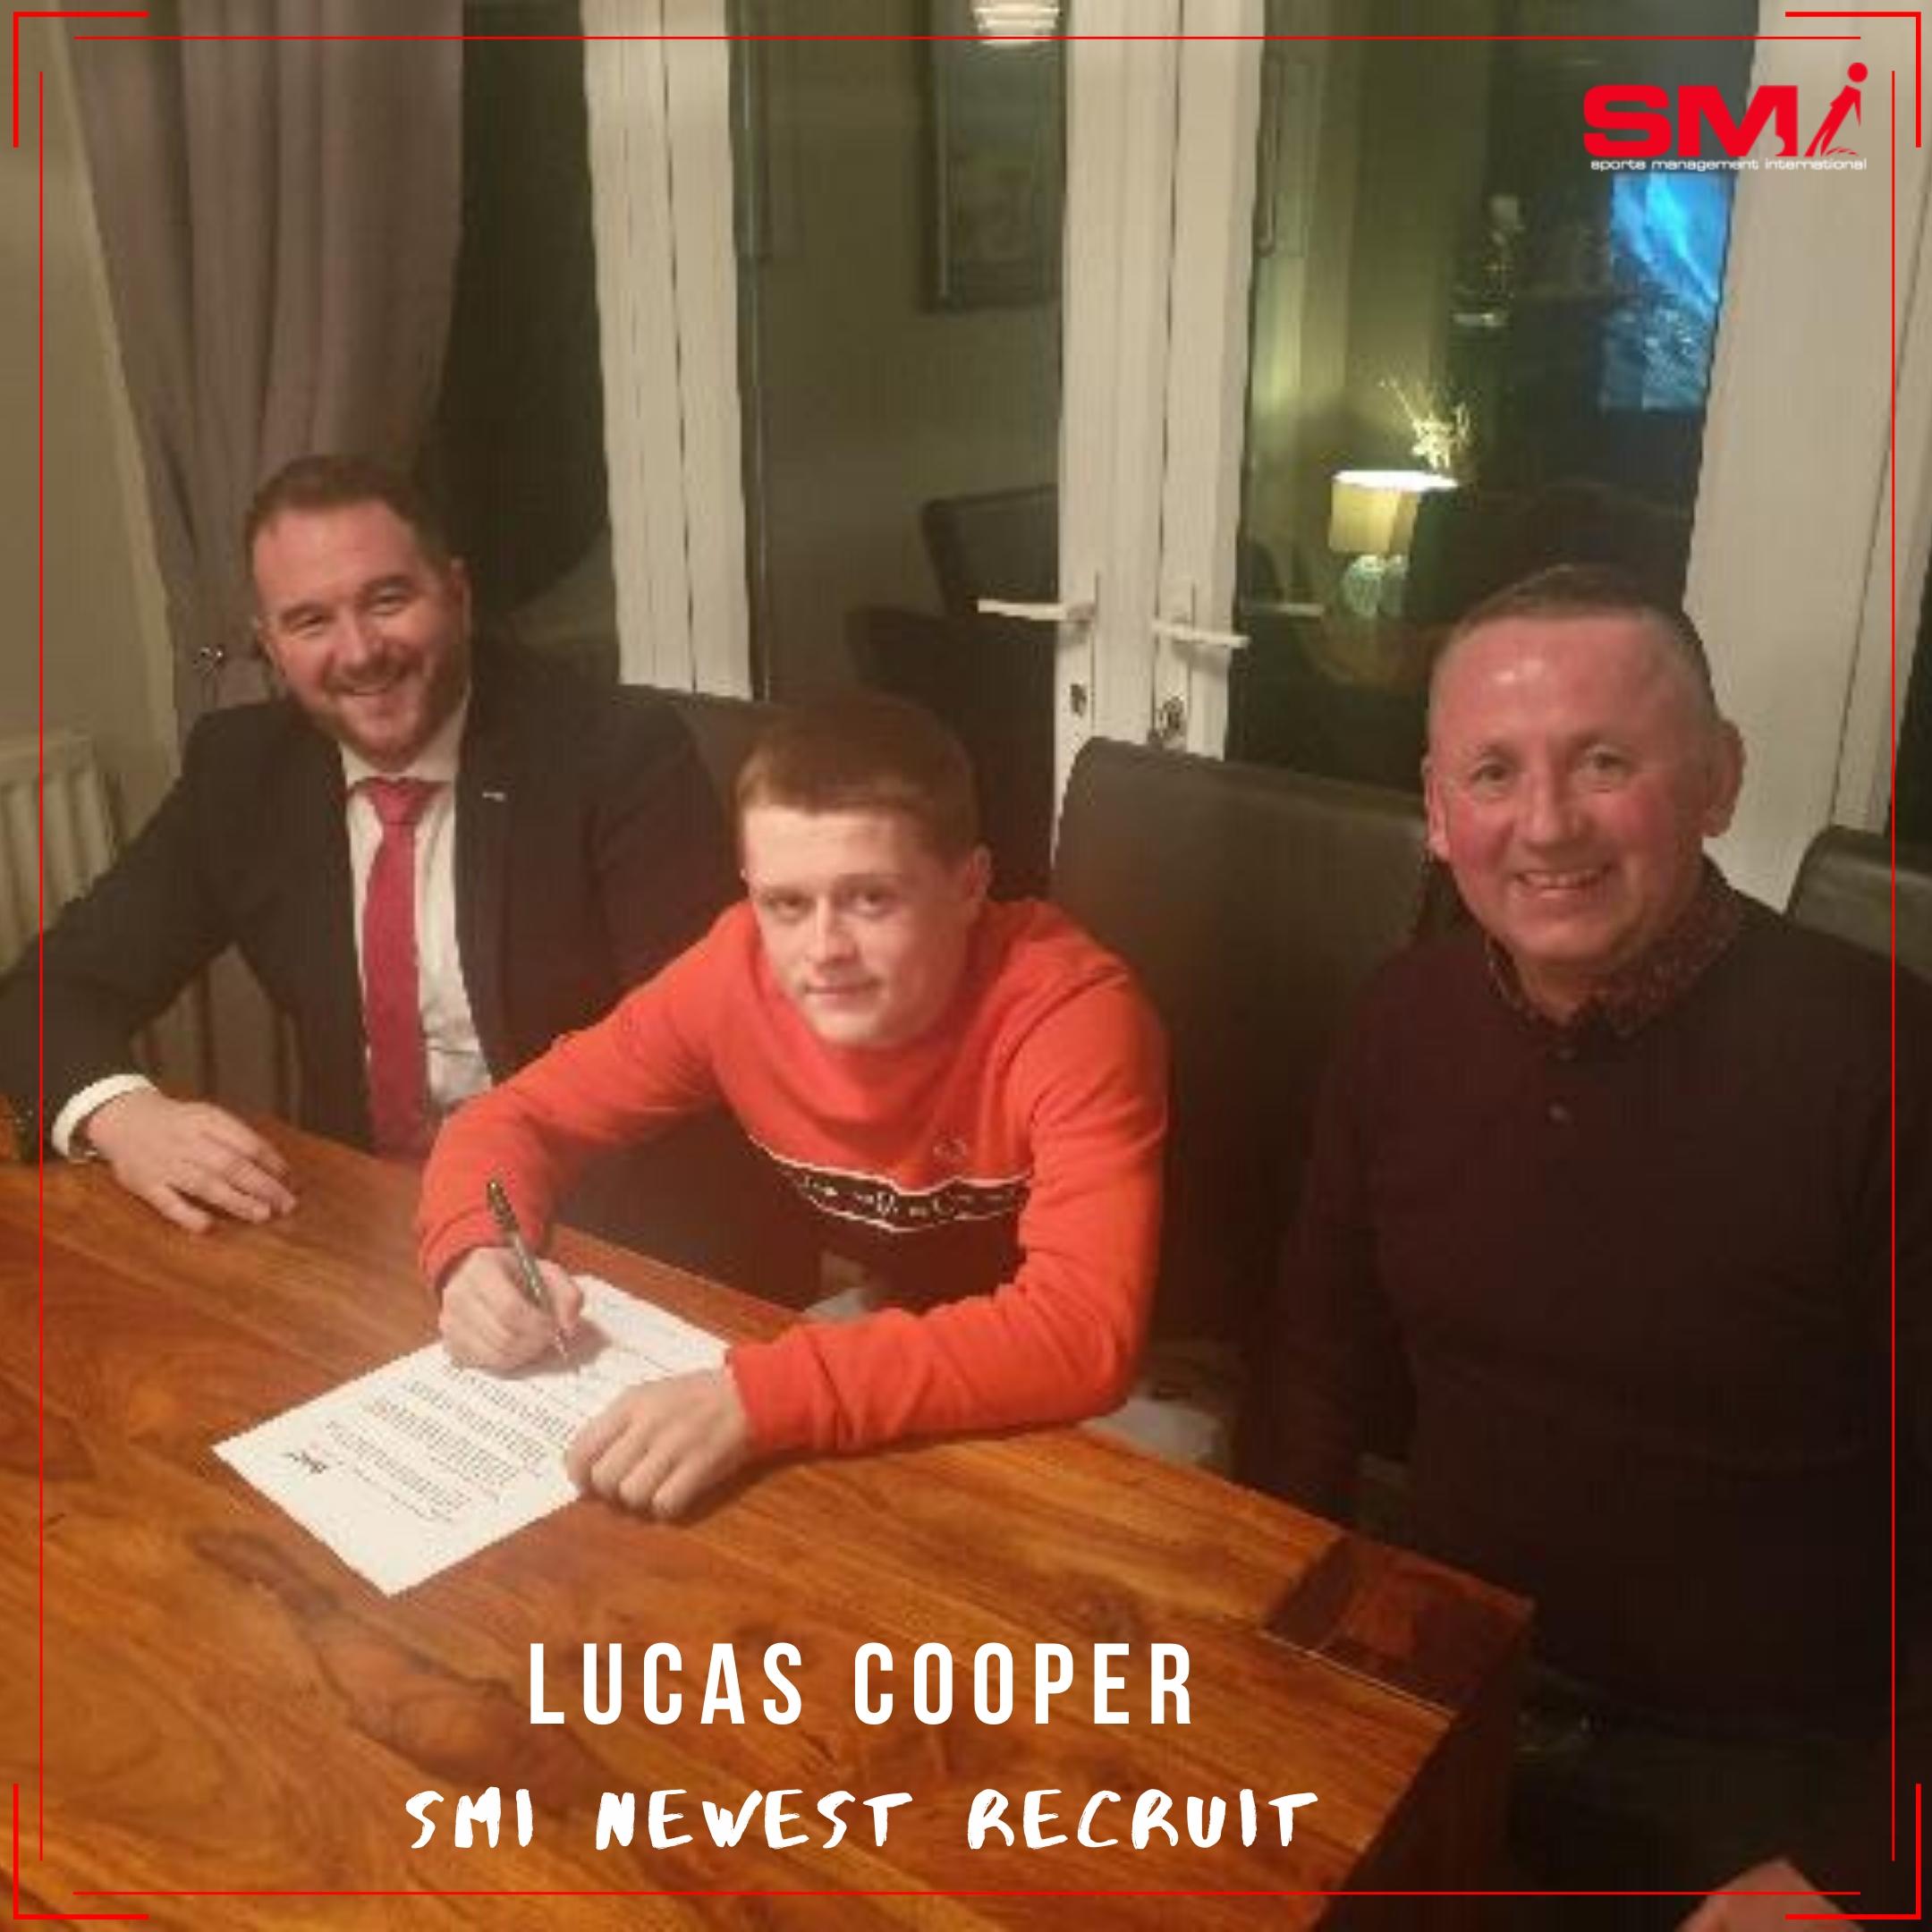 SMI newest recruit Lucas Cooper